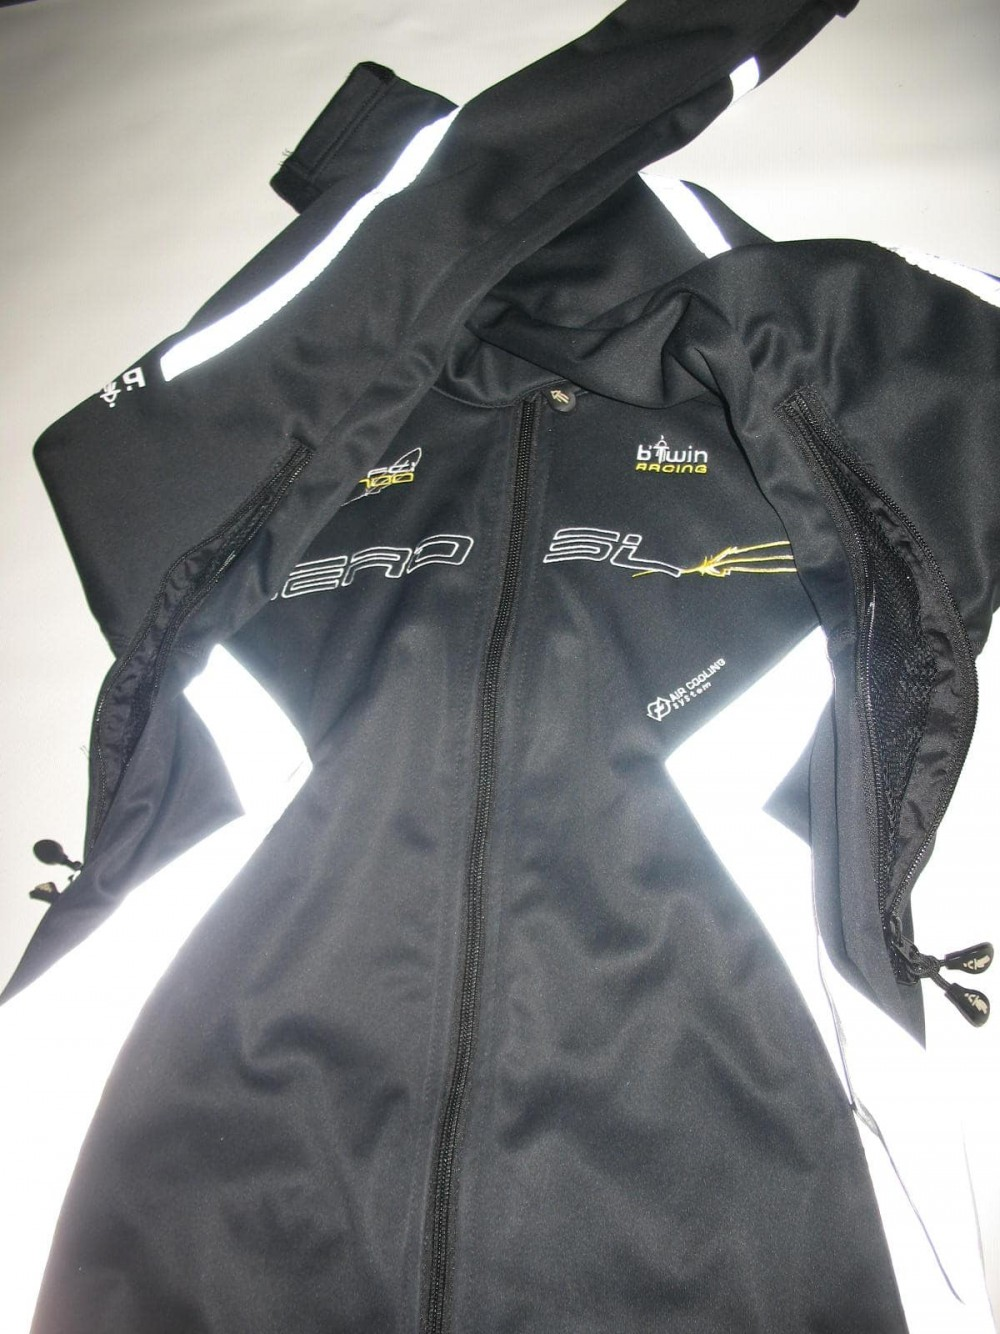 Велокуртка BTWIN aero sl cycling jacket (размер М) - 2